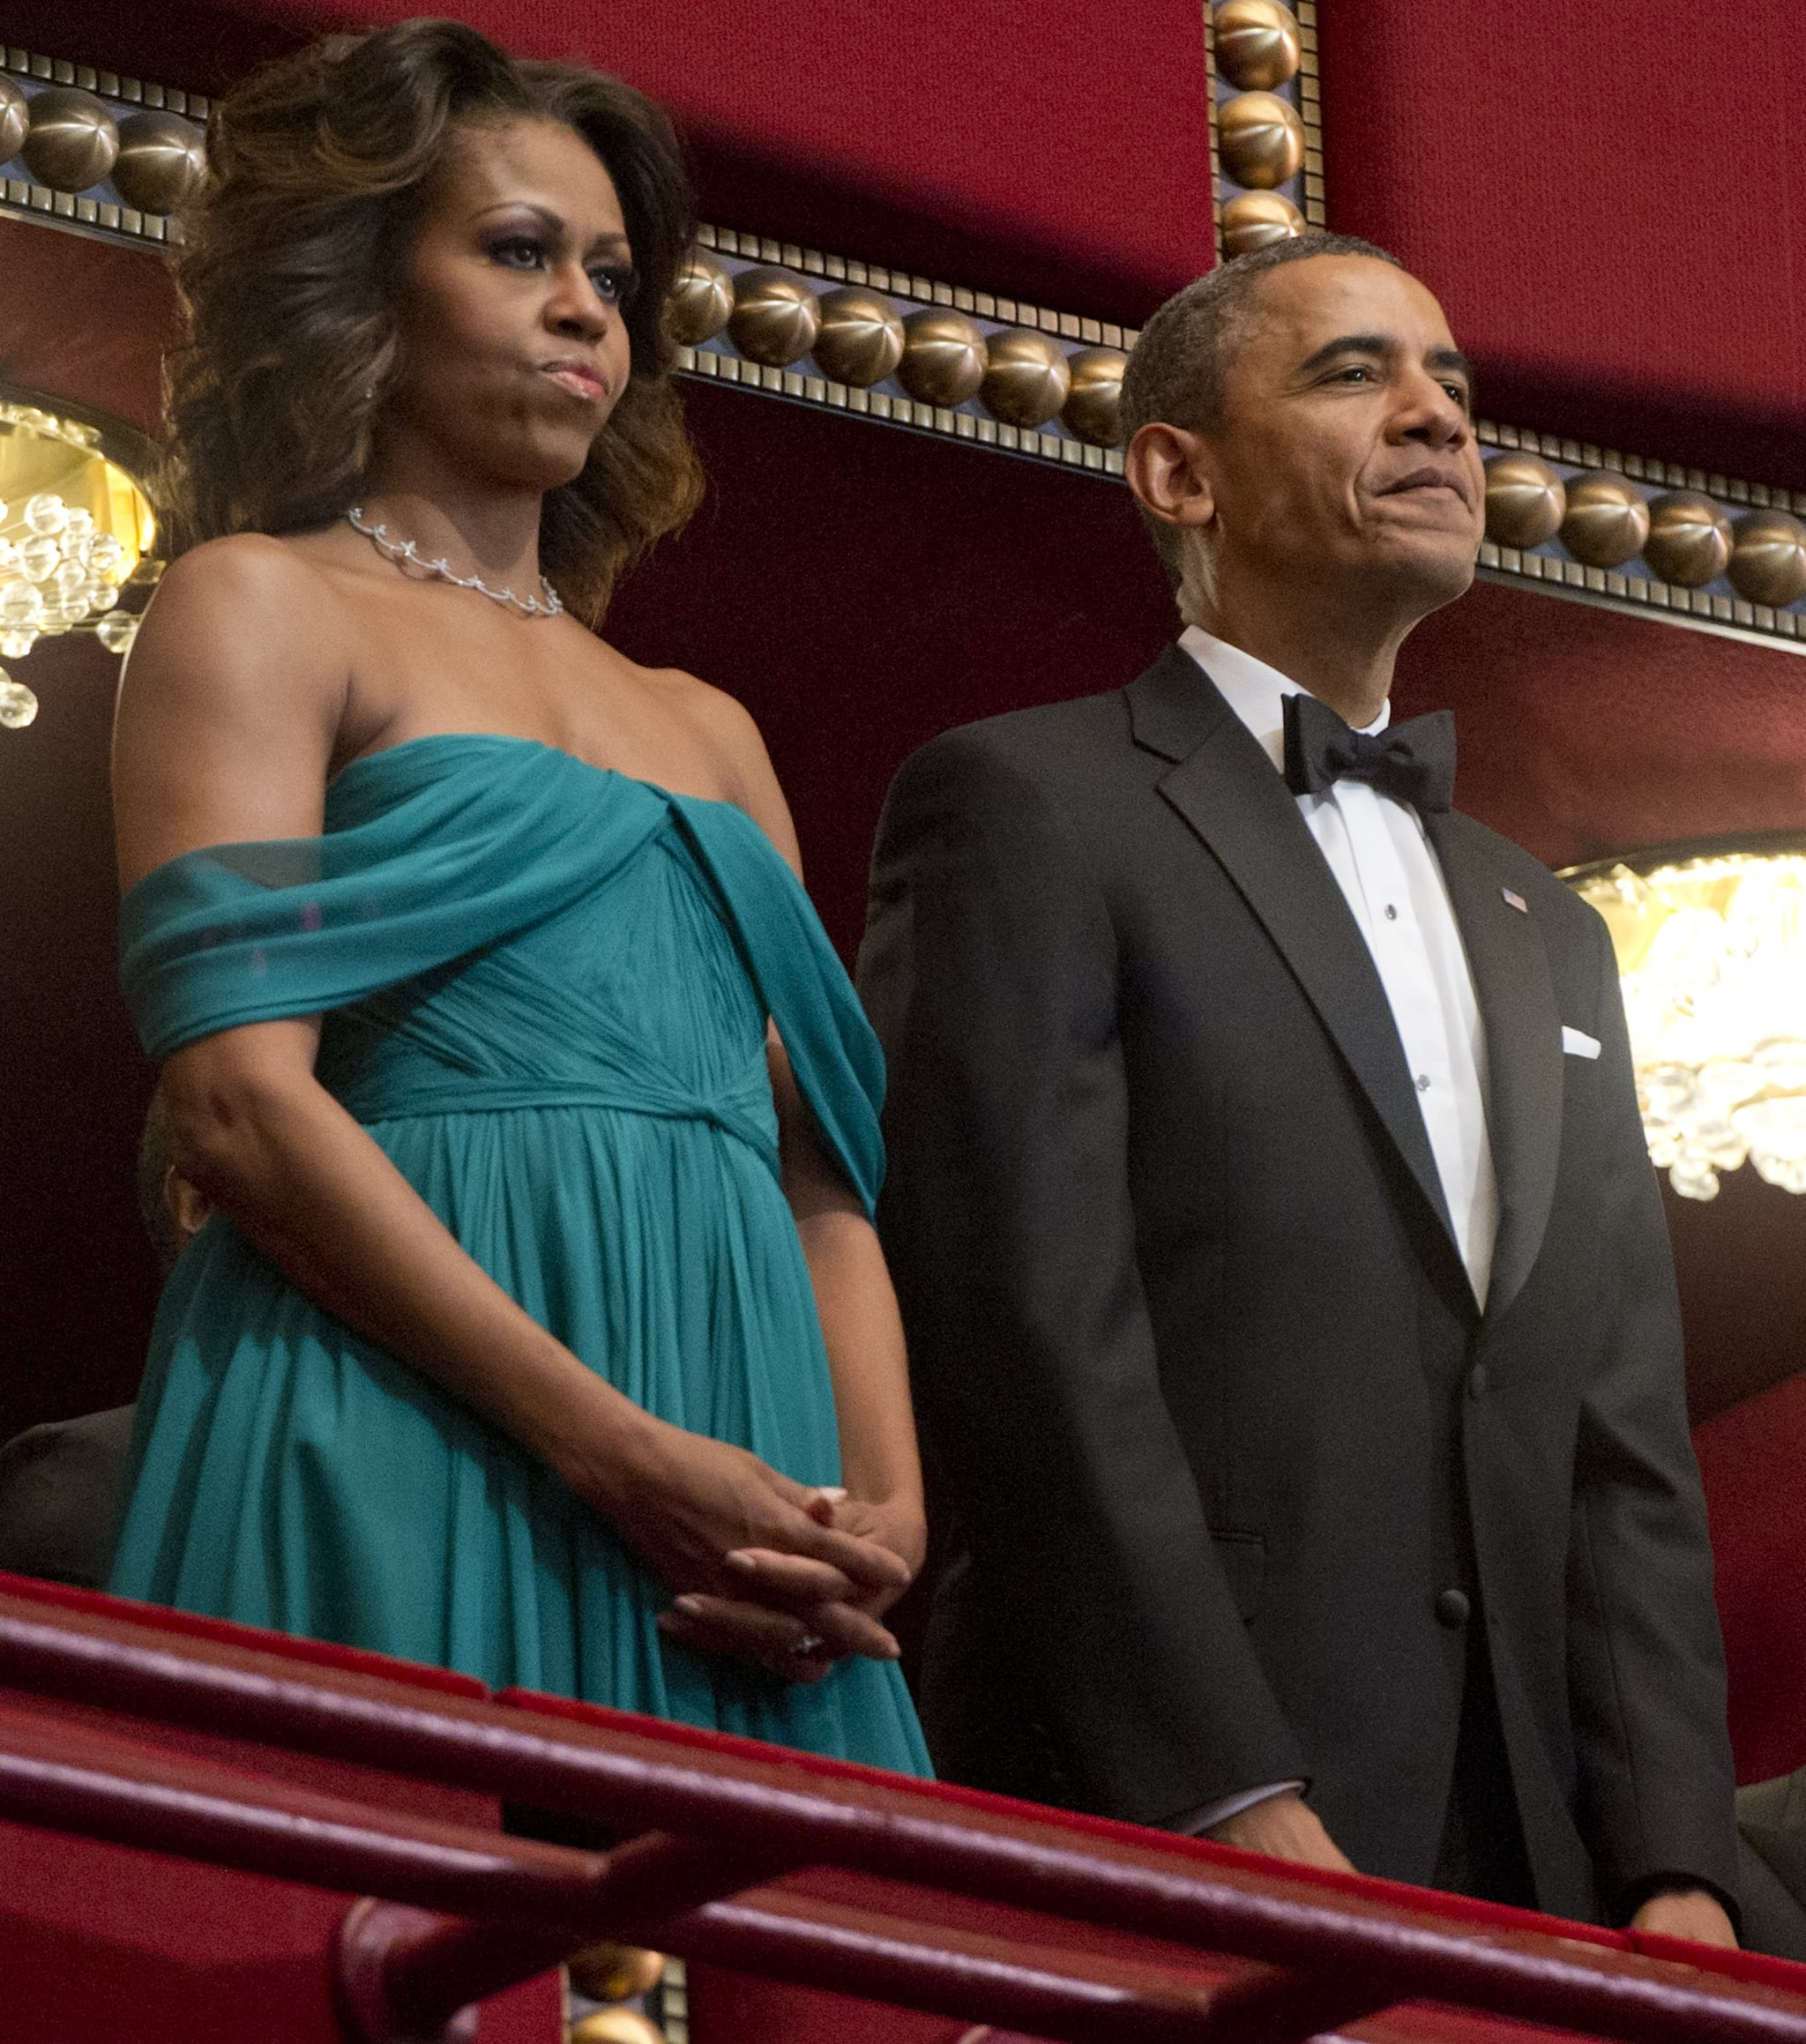 b1d39967ad High School Couple Dresses as Obamas For Prom | POPSUGAR News